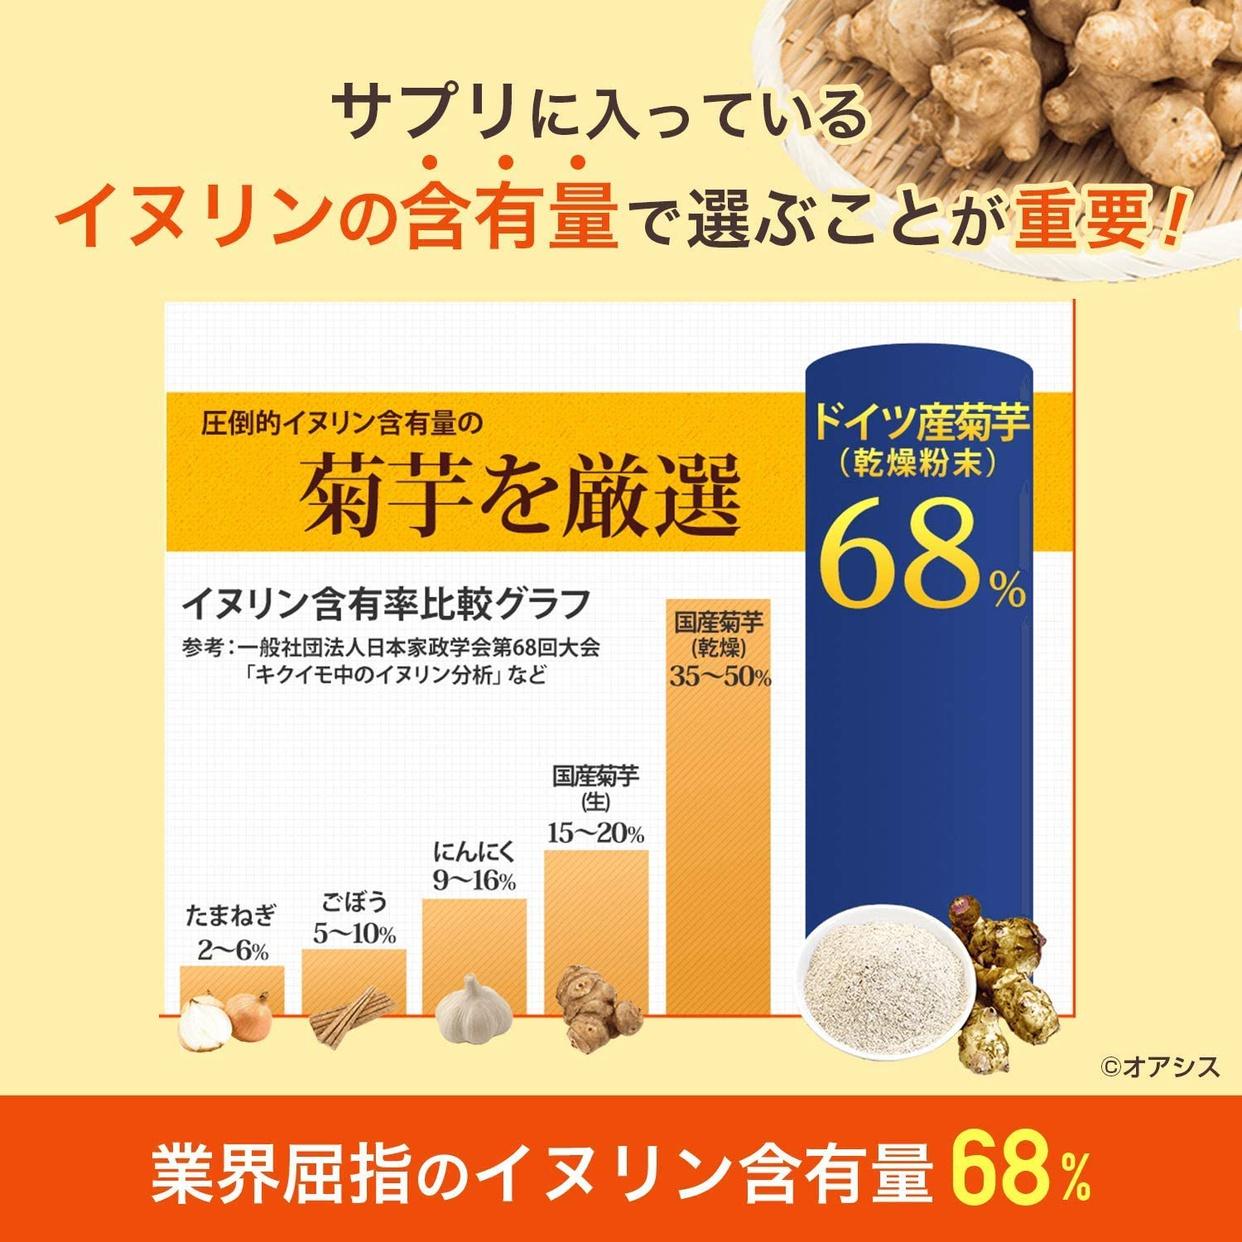 OASIS(オアシス) 前田の菊芋の商品画像5